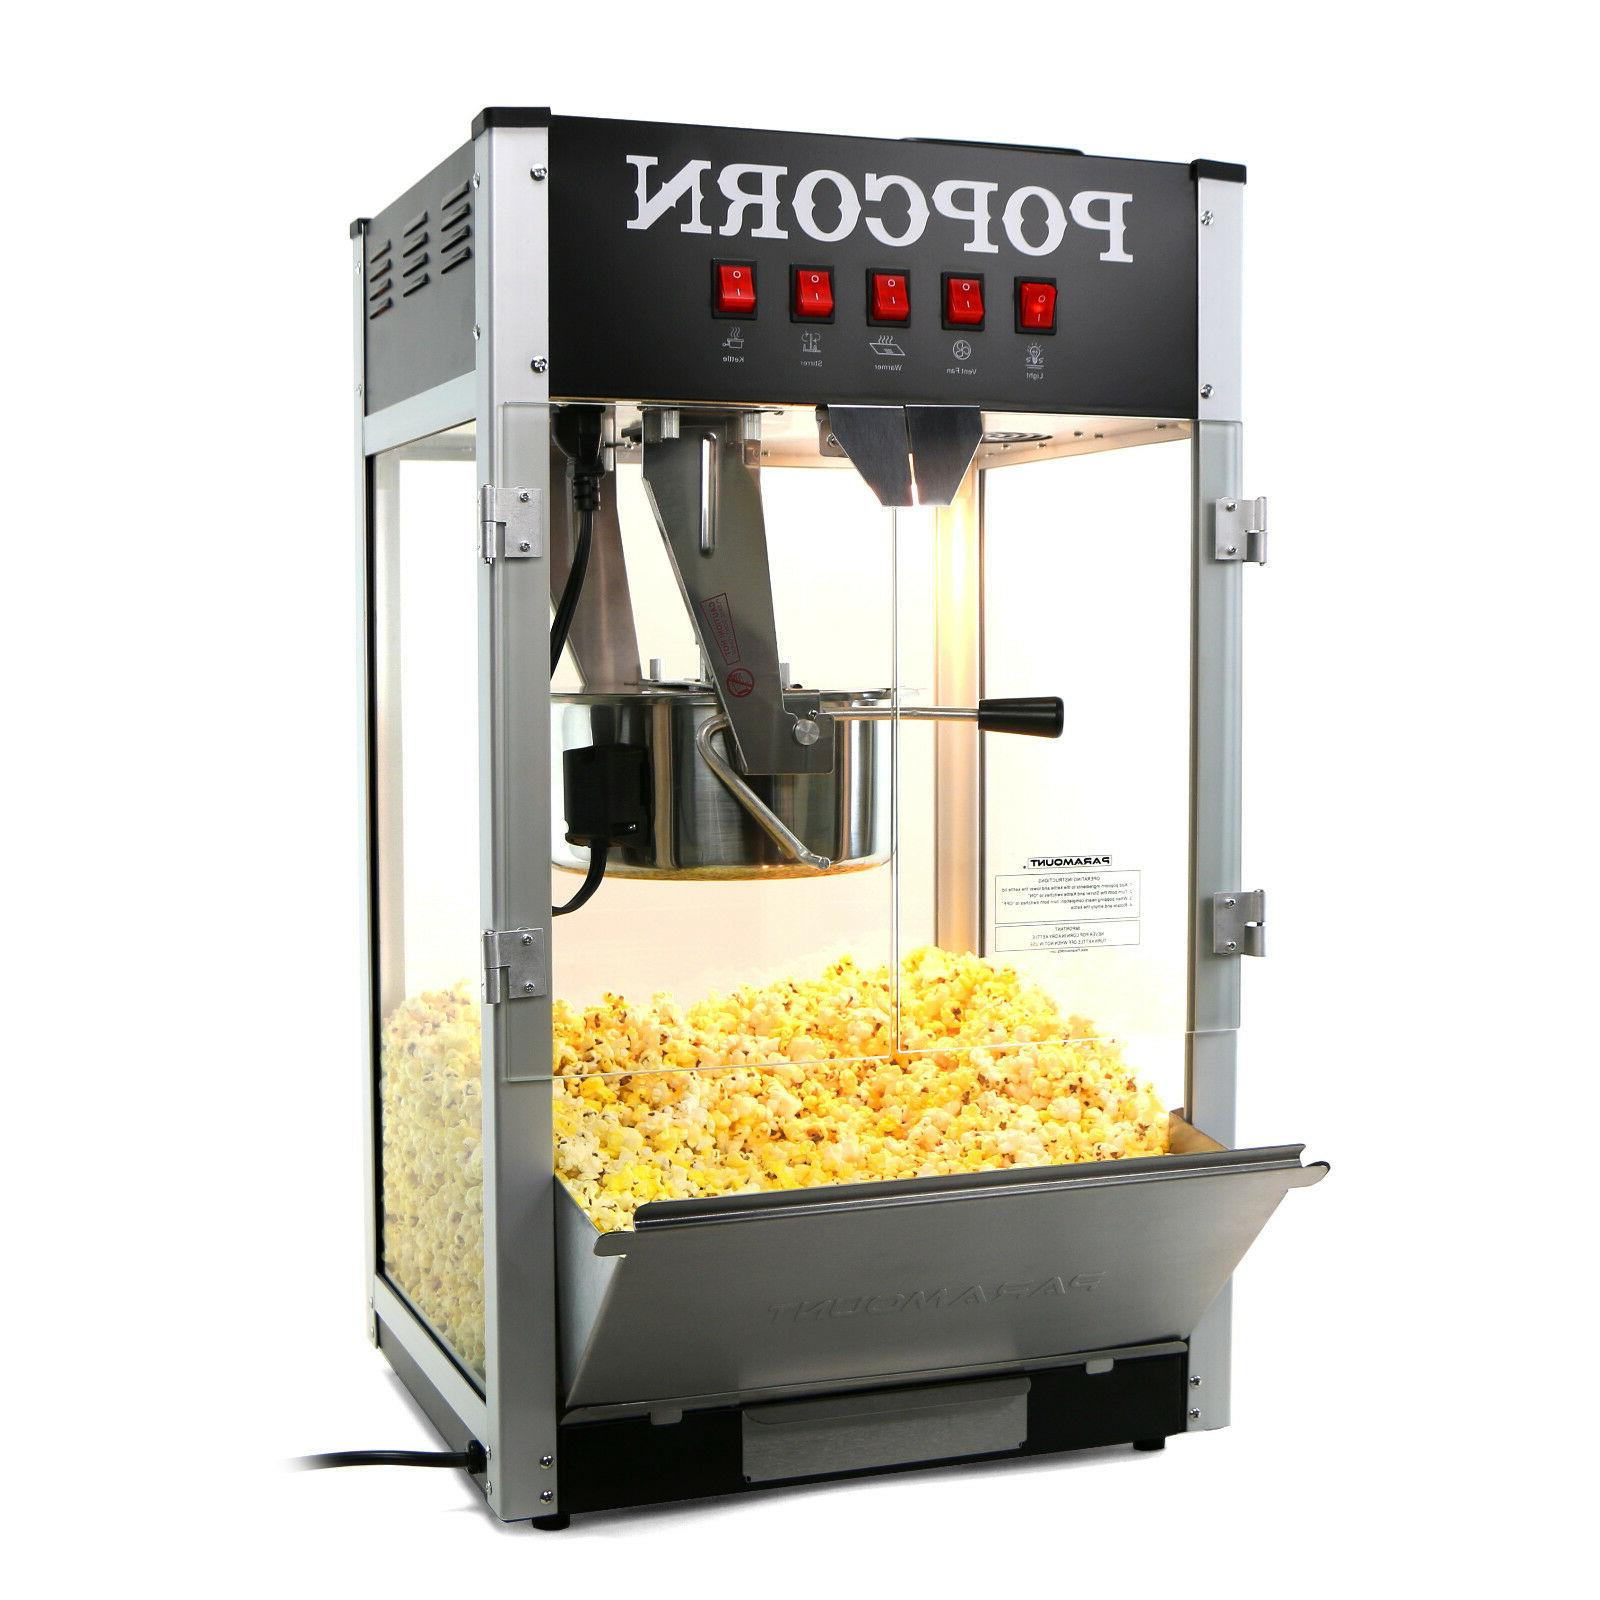 Paramount 16oz Commercial Popcorn Maker Machine - 16 oz Kett